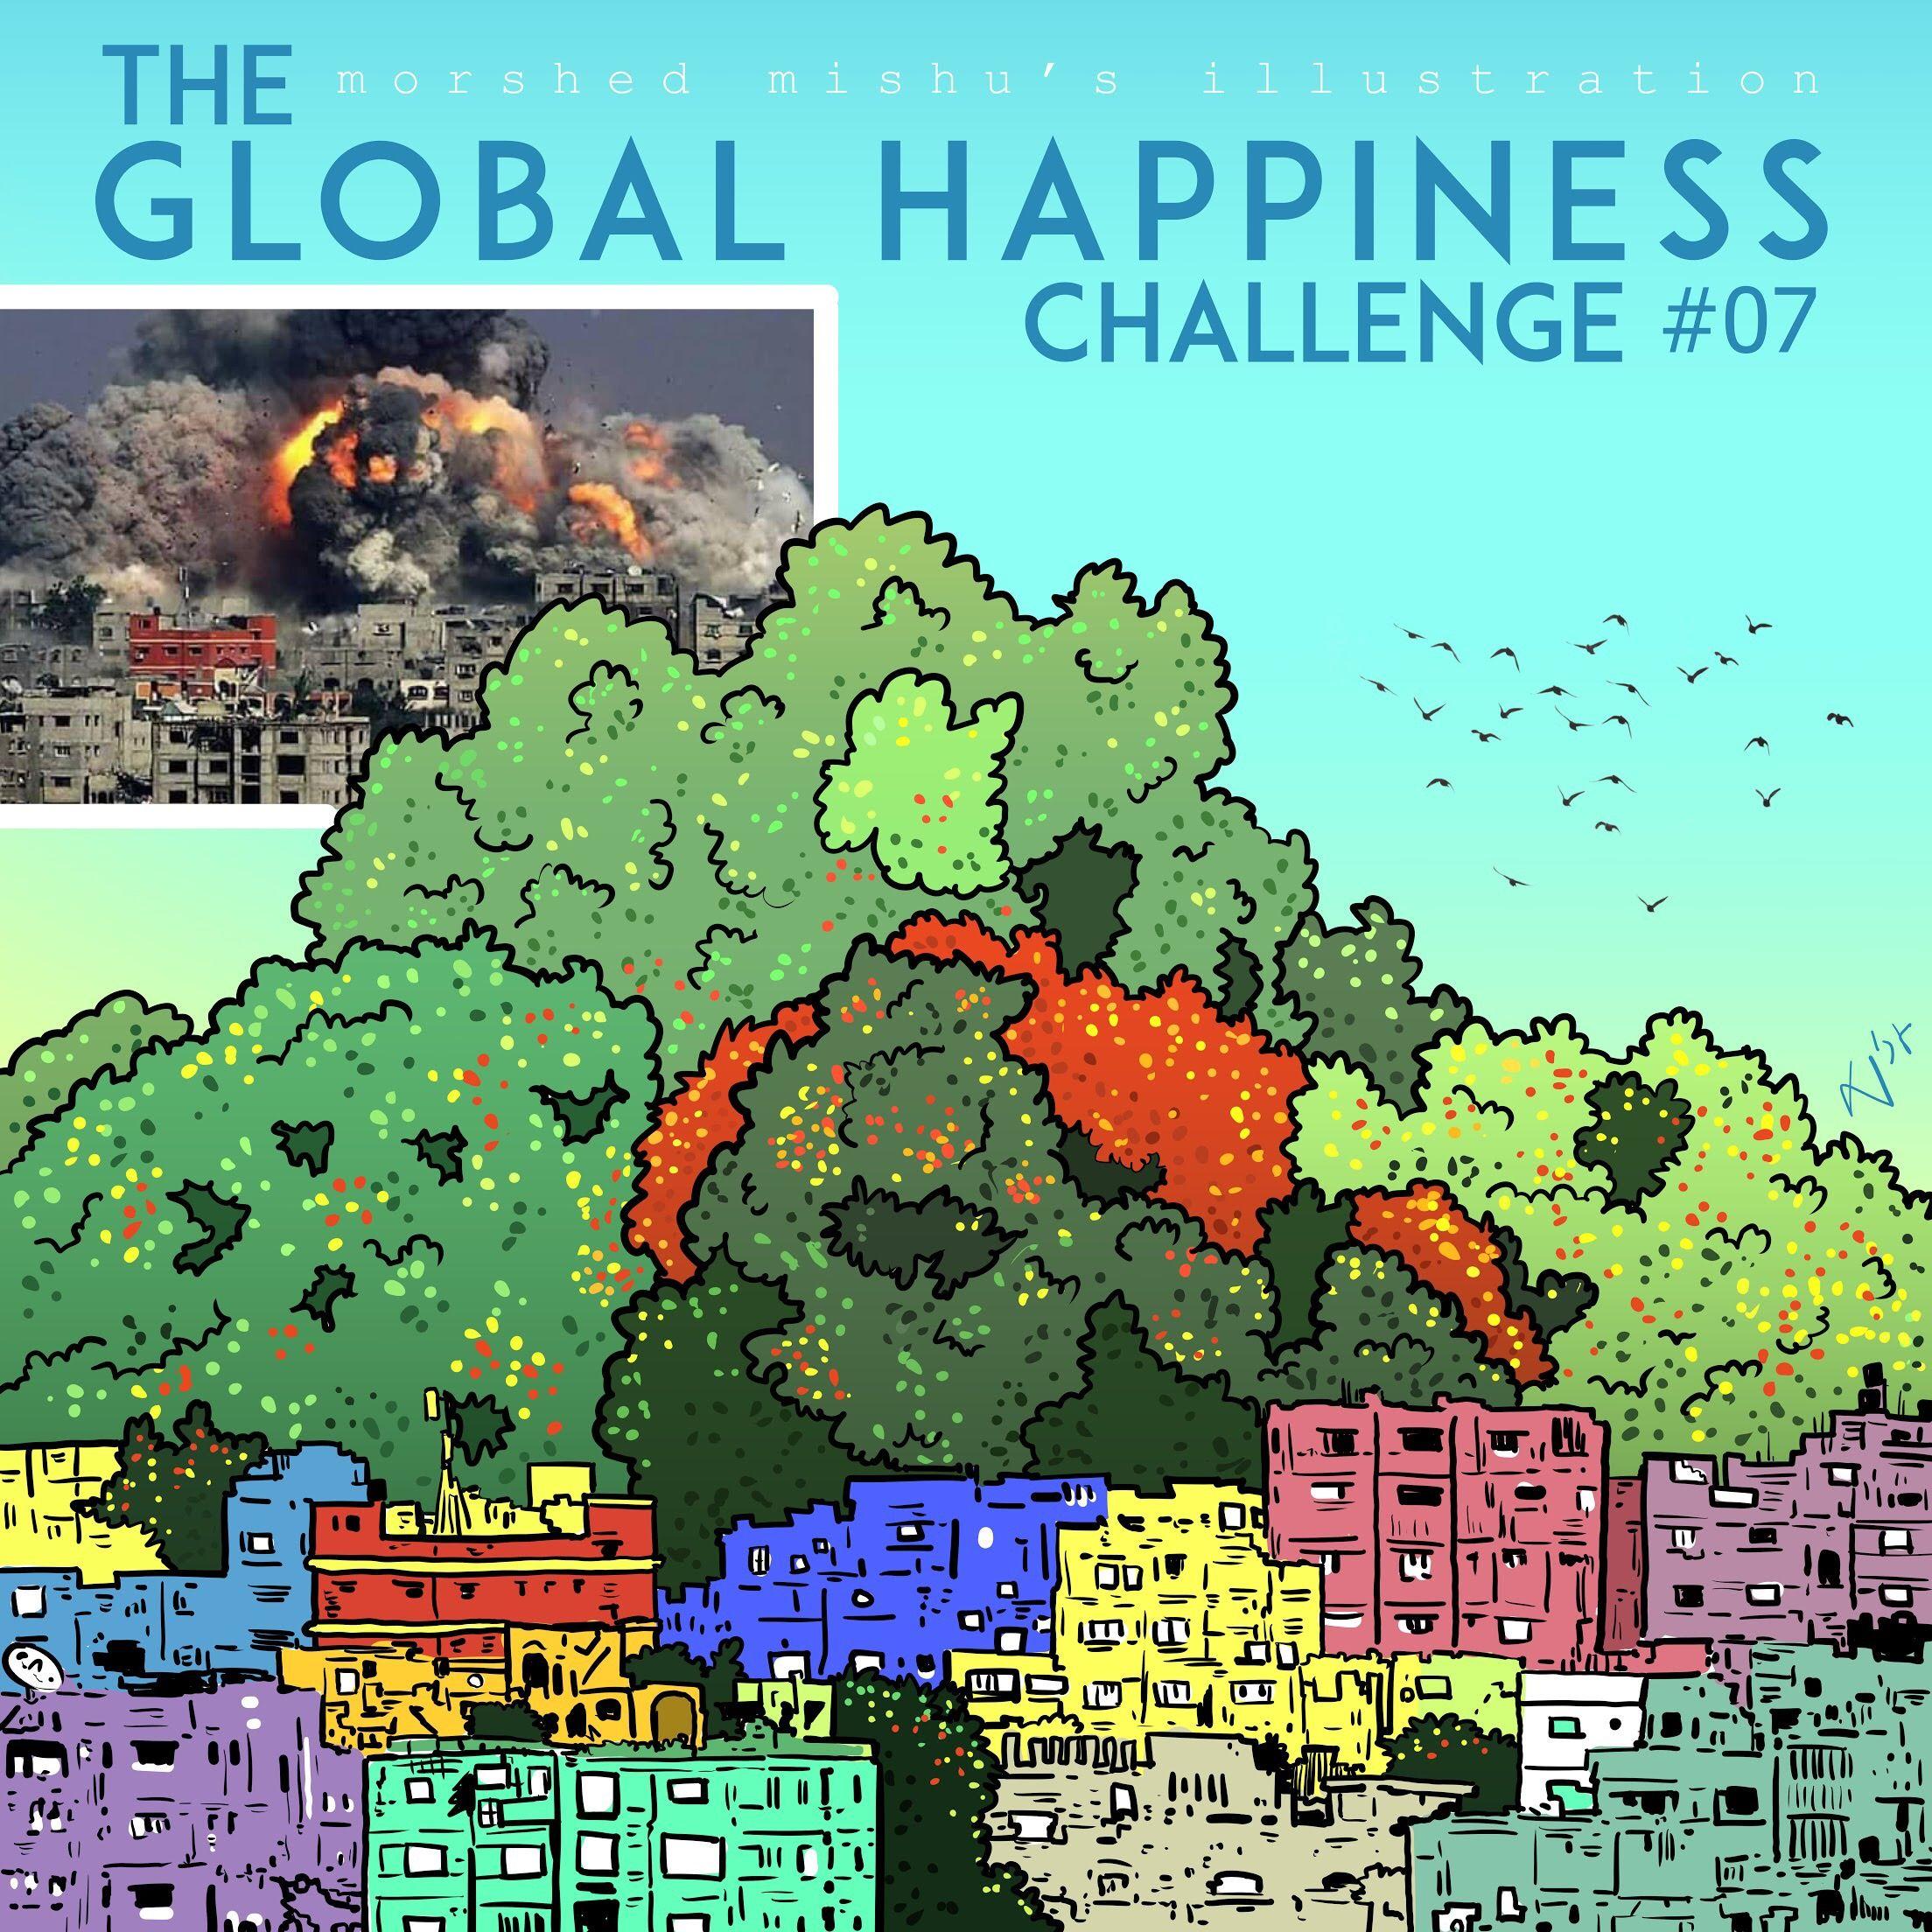 The Global Happiness Challenge #7 #global #happiness #challenge